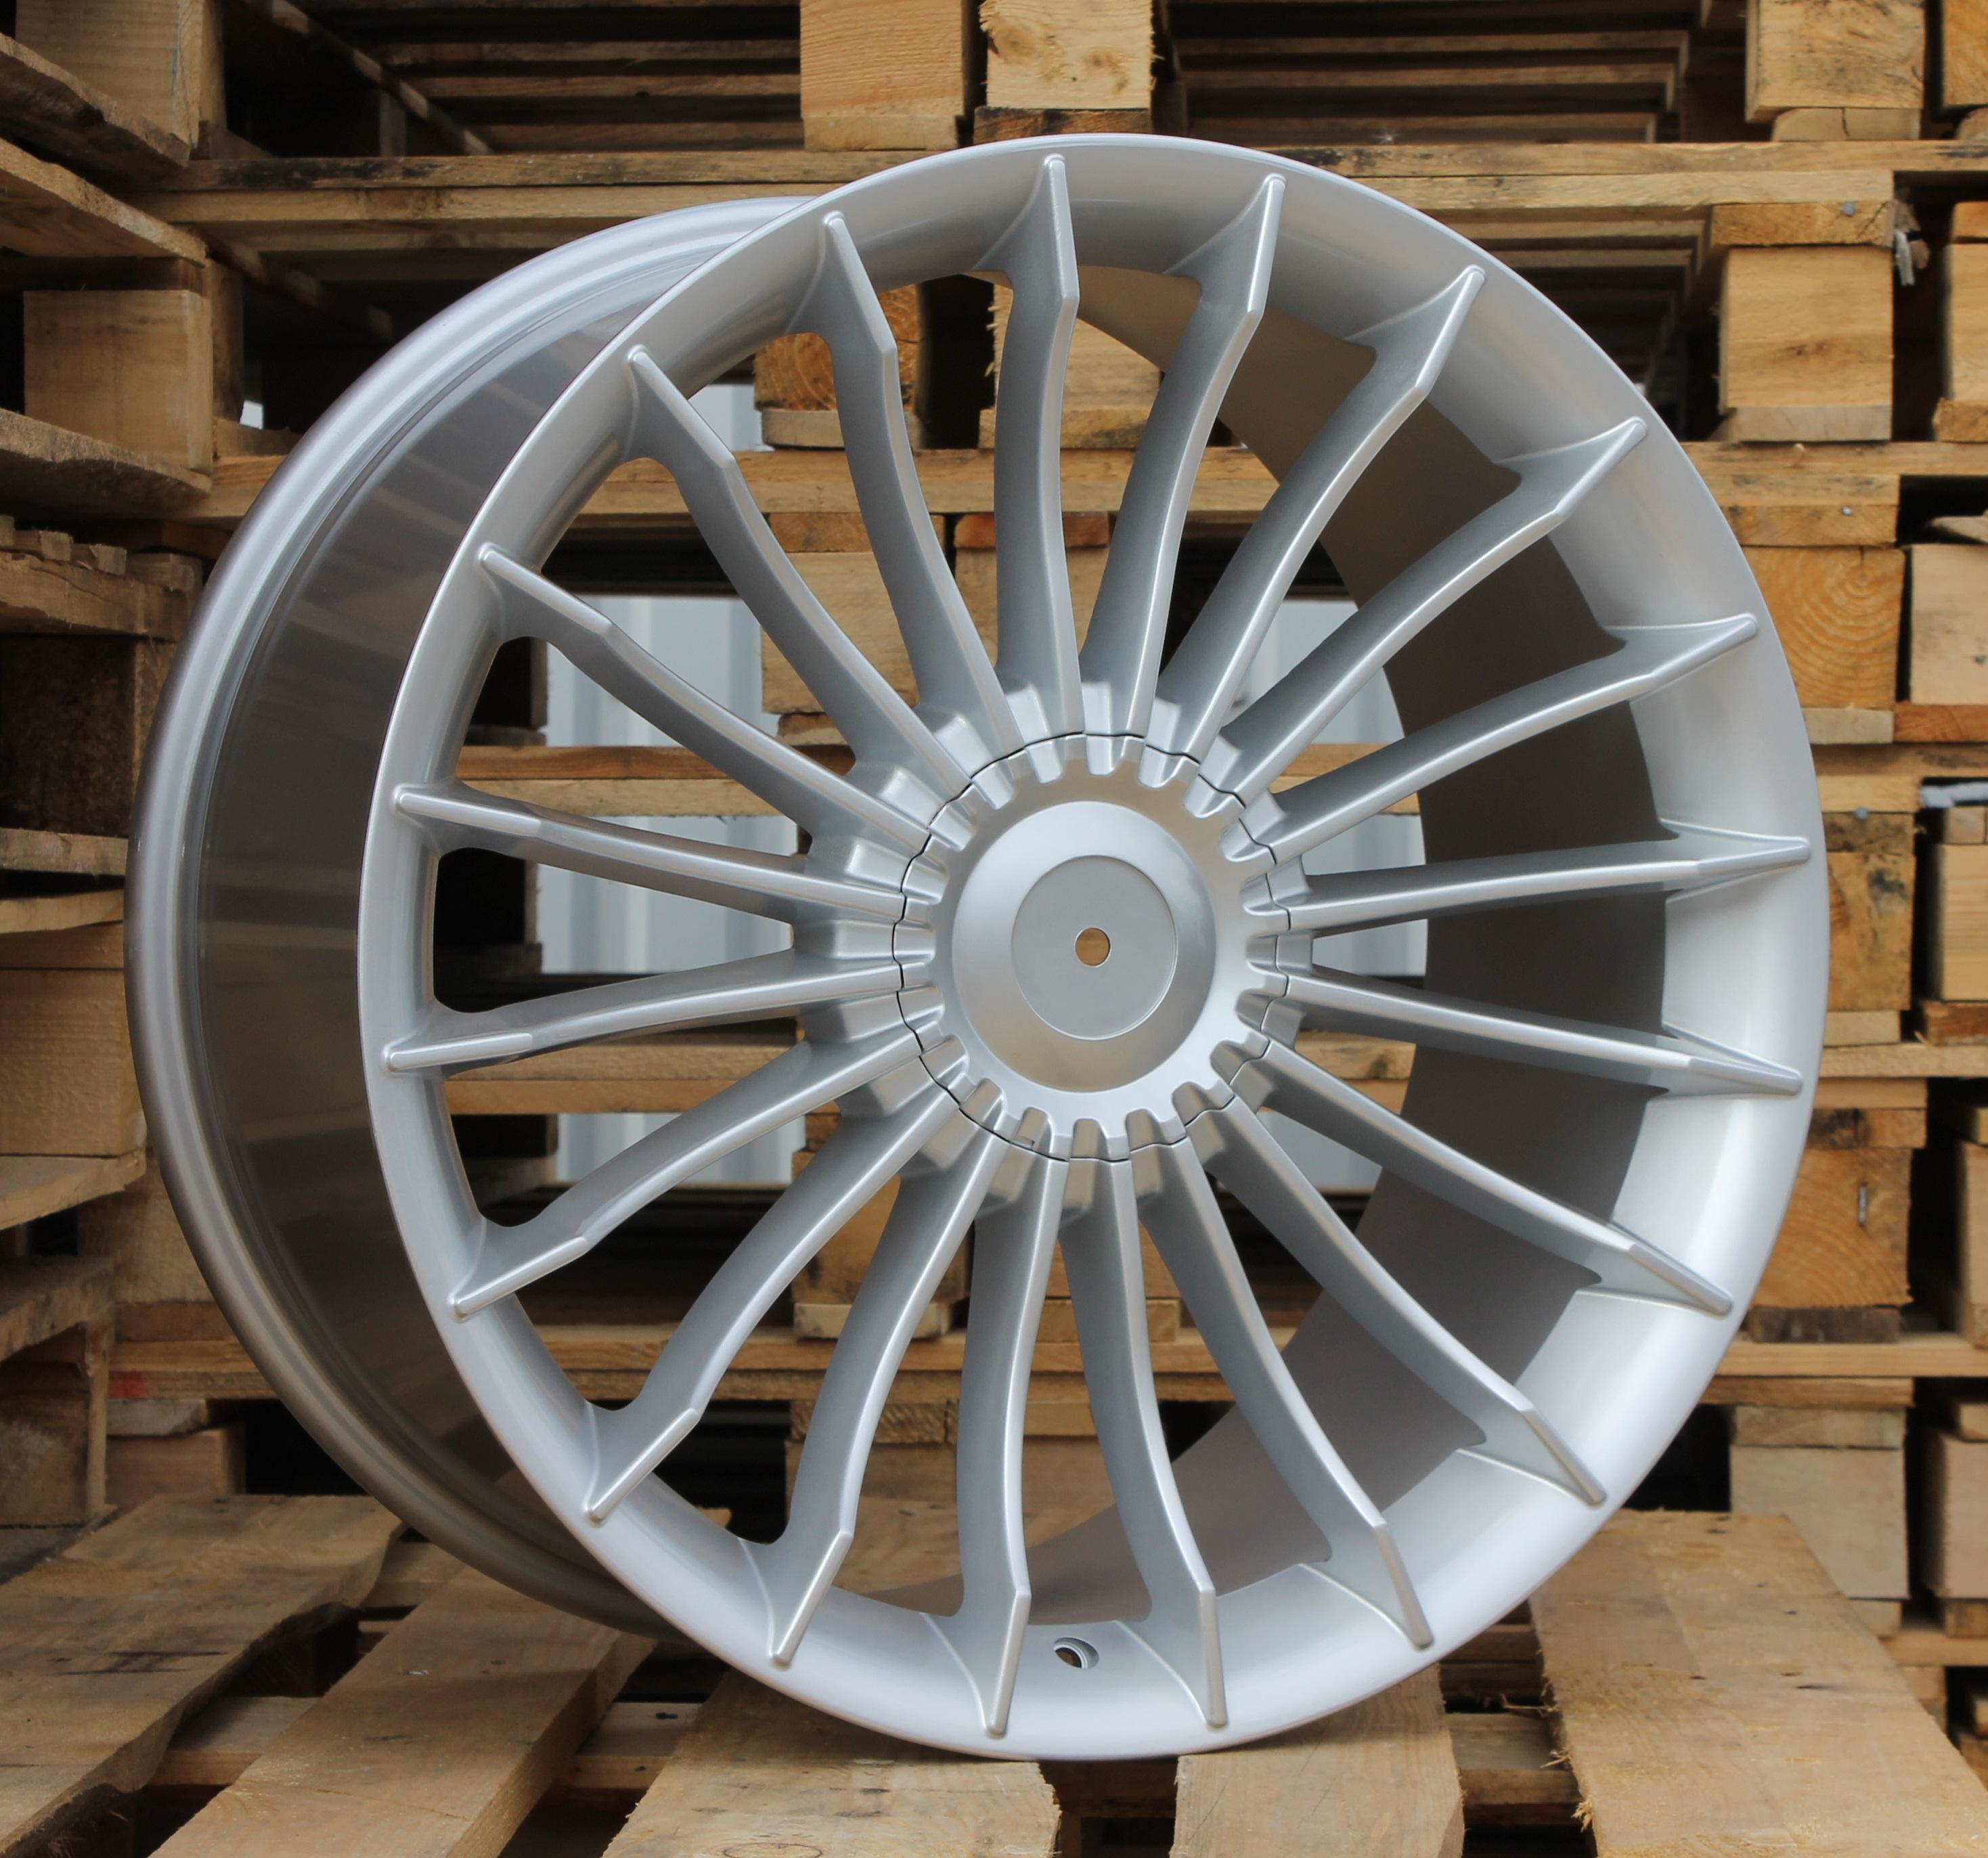 B18X8.5 5X120 ET20 74.1 BK273 SI (Rear+Front) RWR Style Alpina (P)## 8.5x18 ET19 5x120